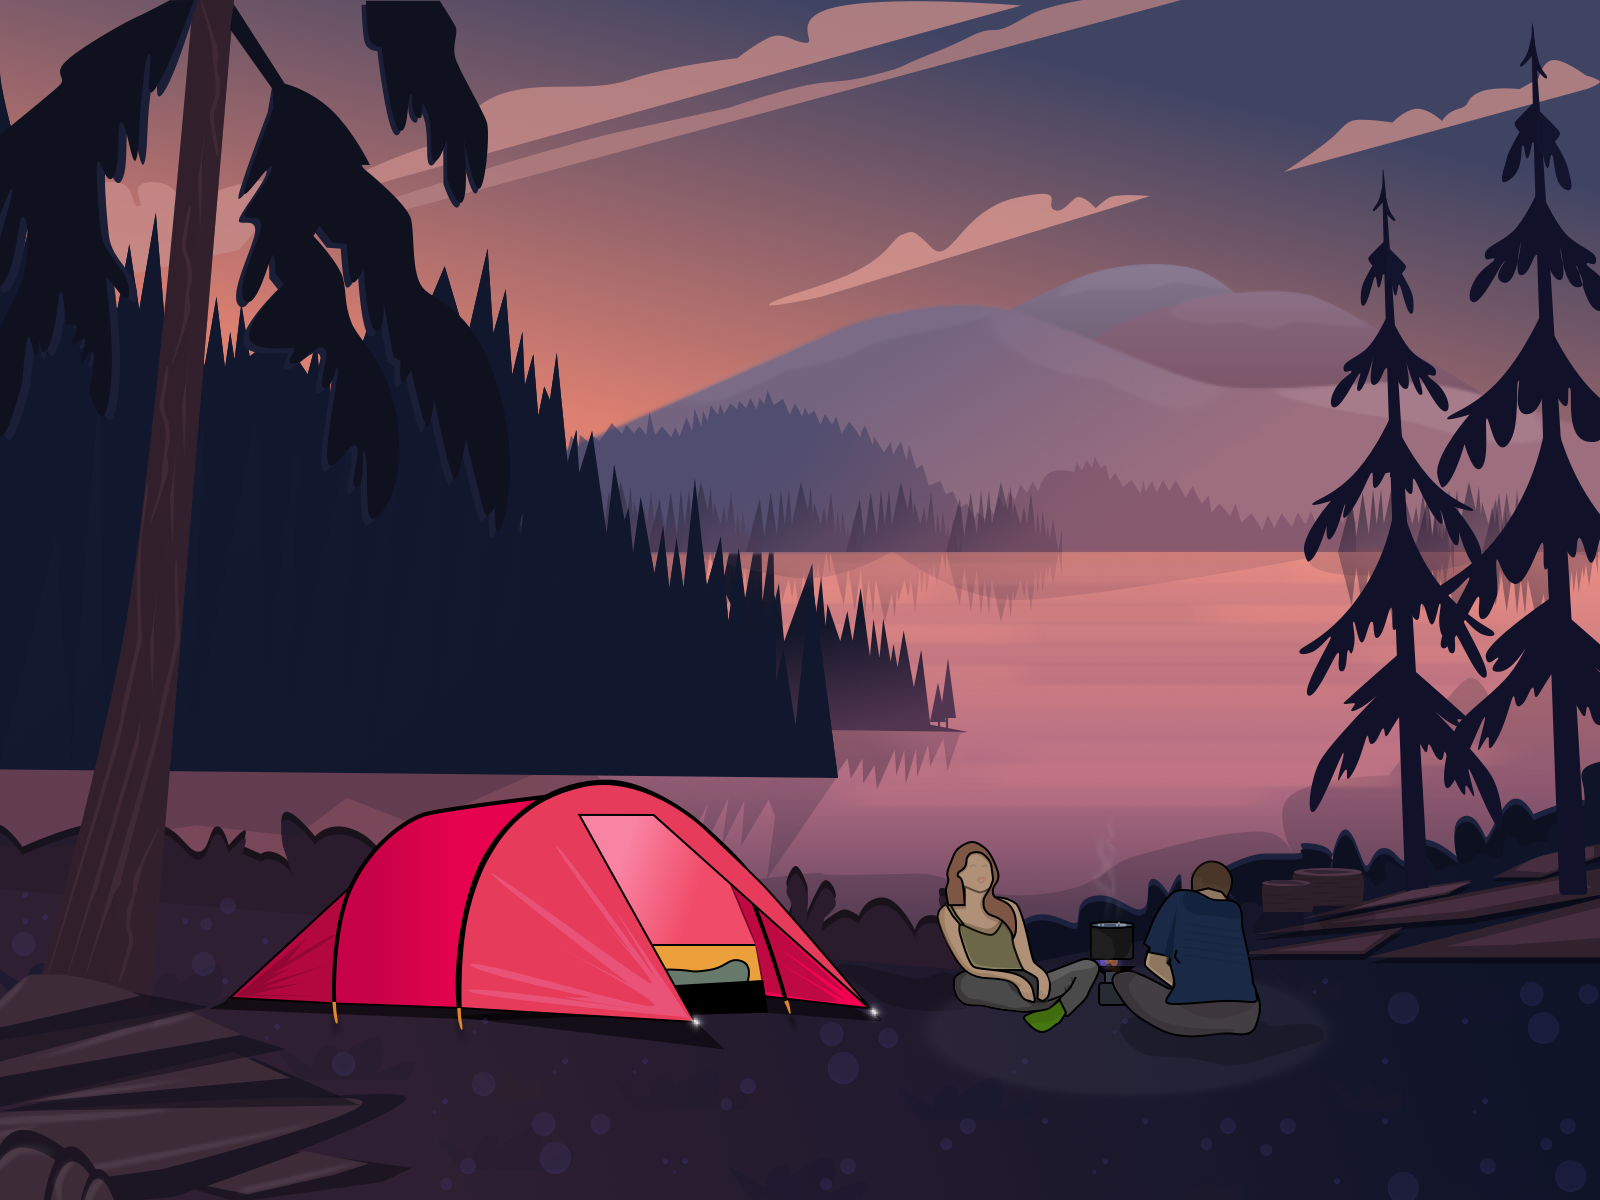 Camping dribbble 2x